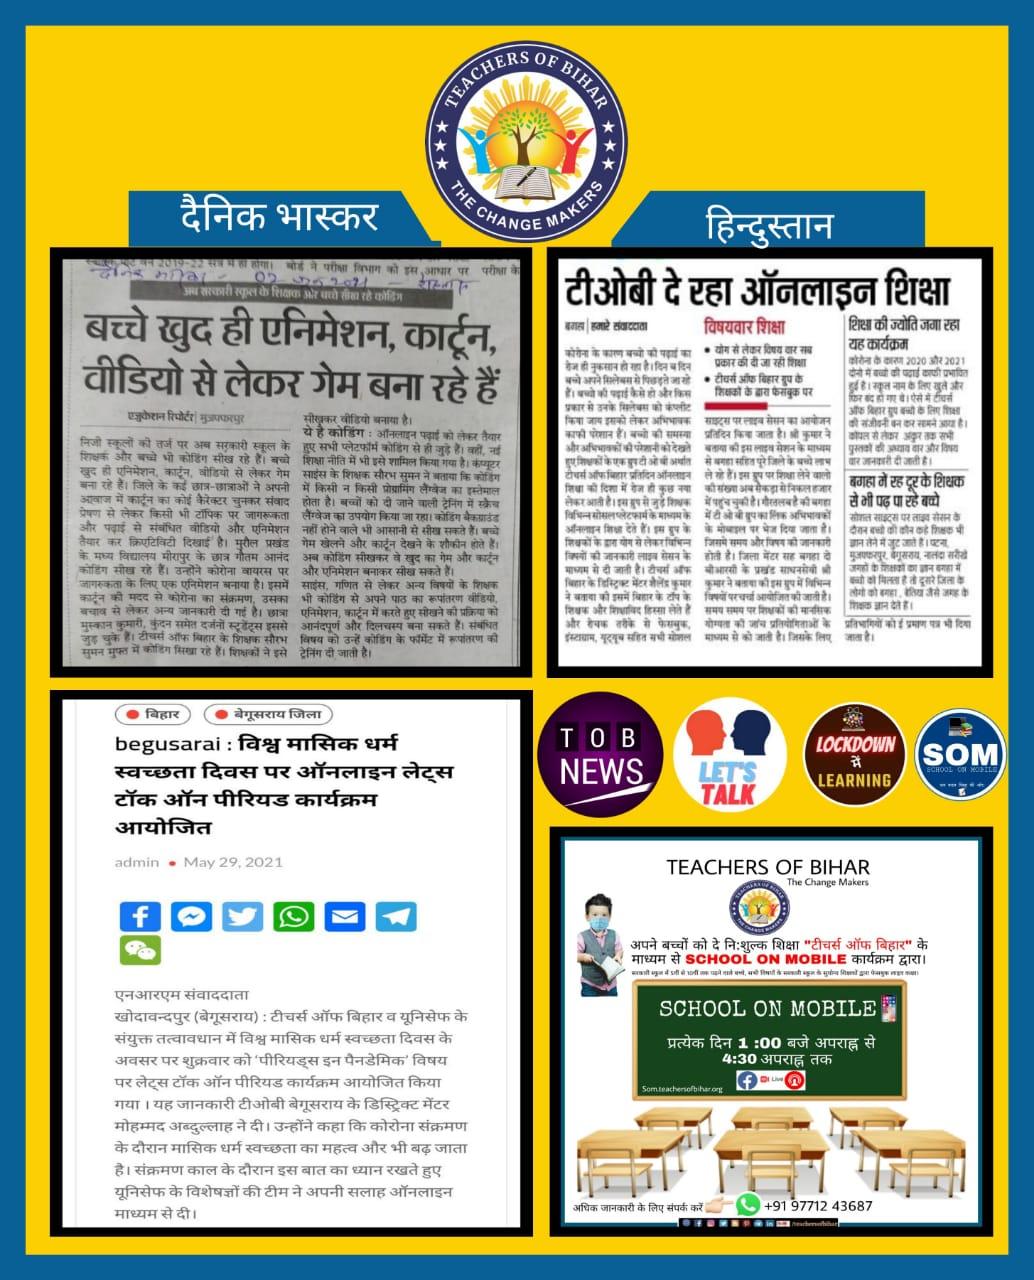 Teachers of Bihar , 05.06.2021